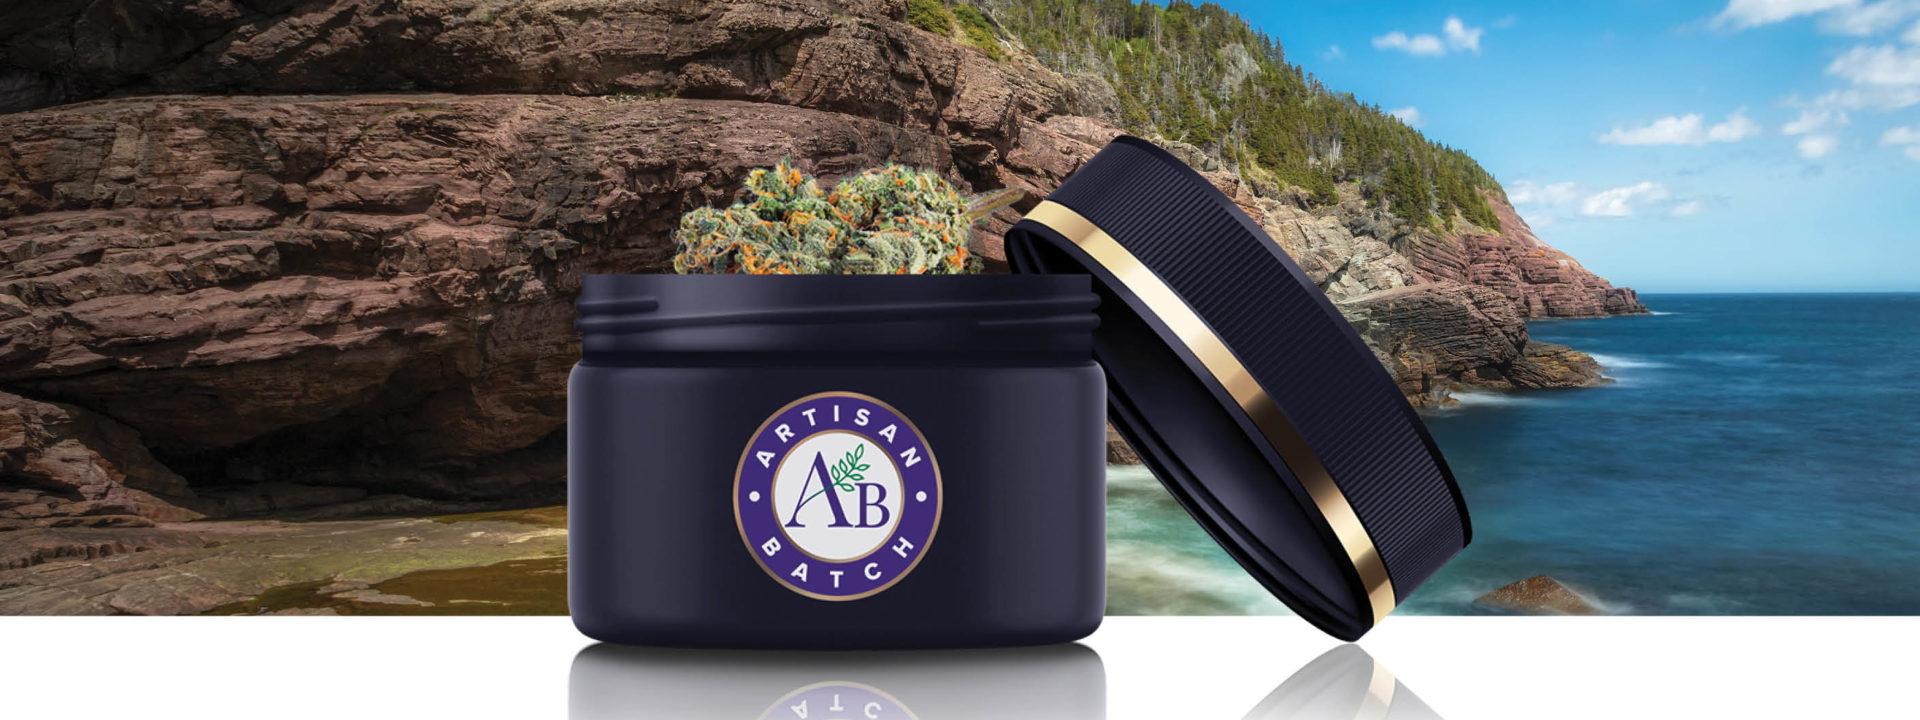 KRFT Cannabis Newfoundland